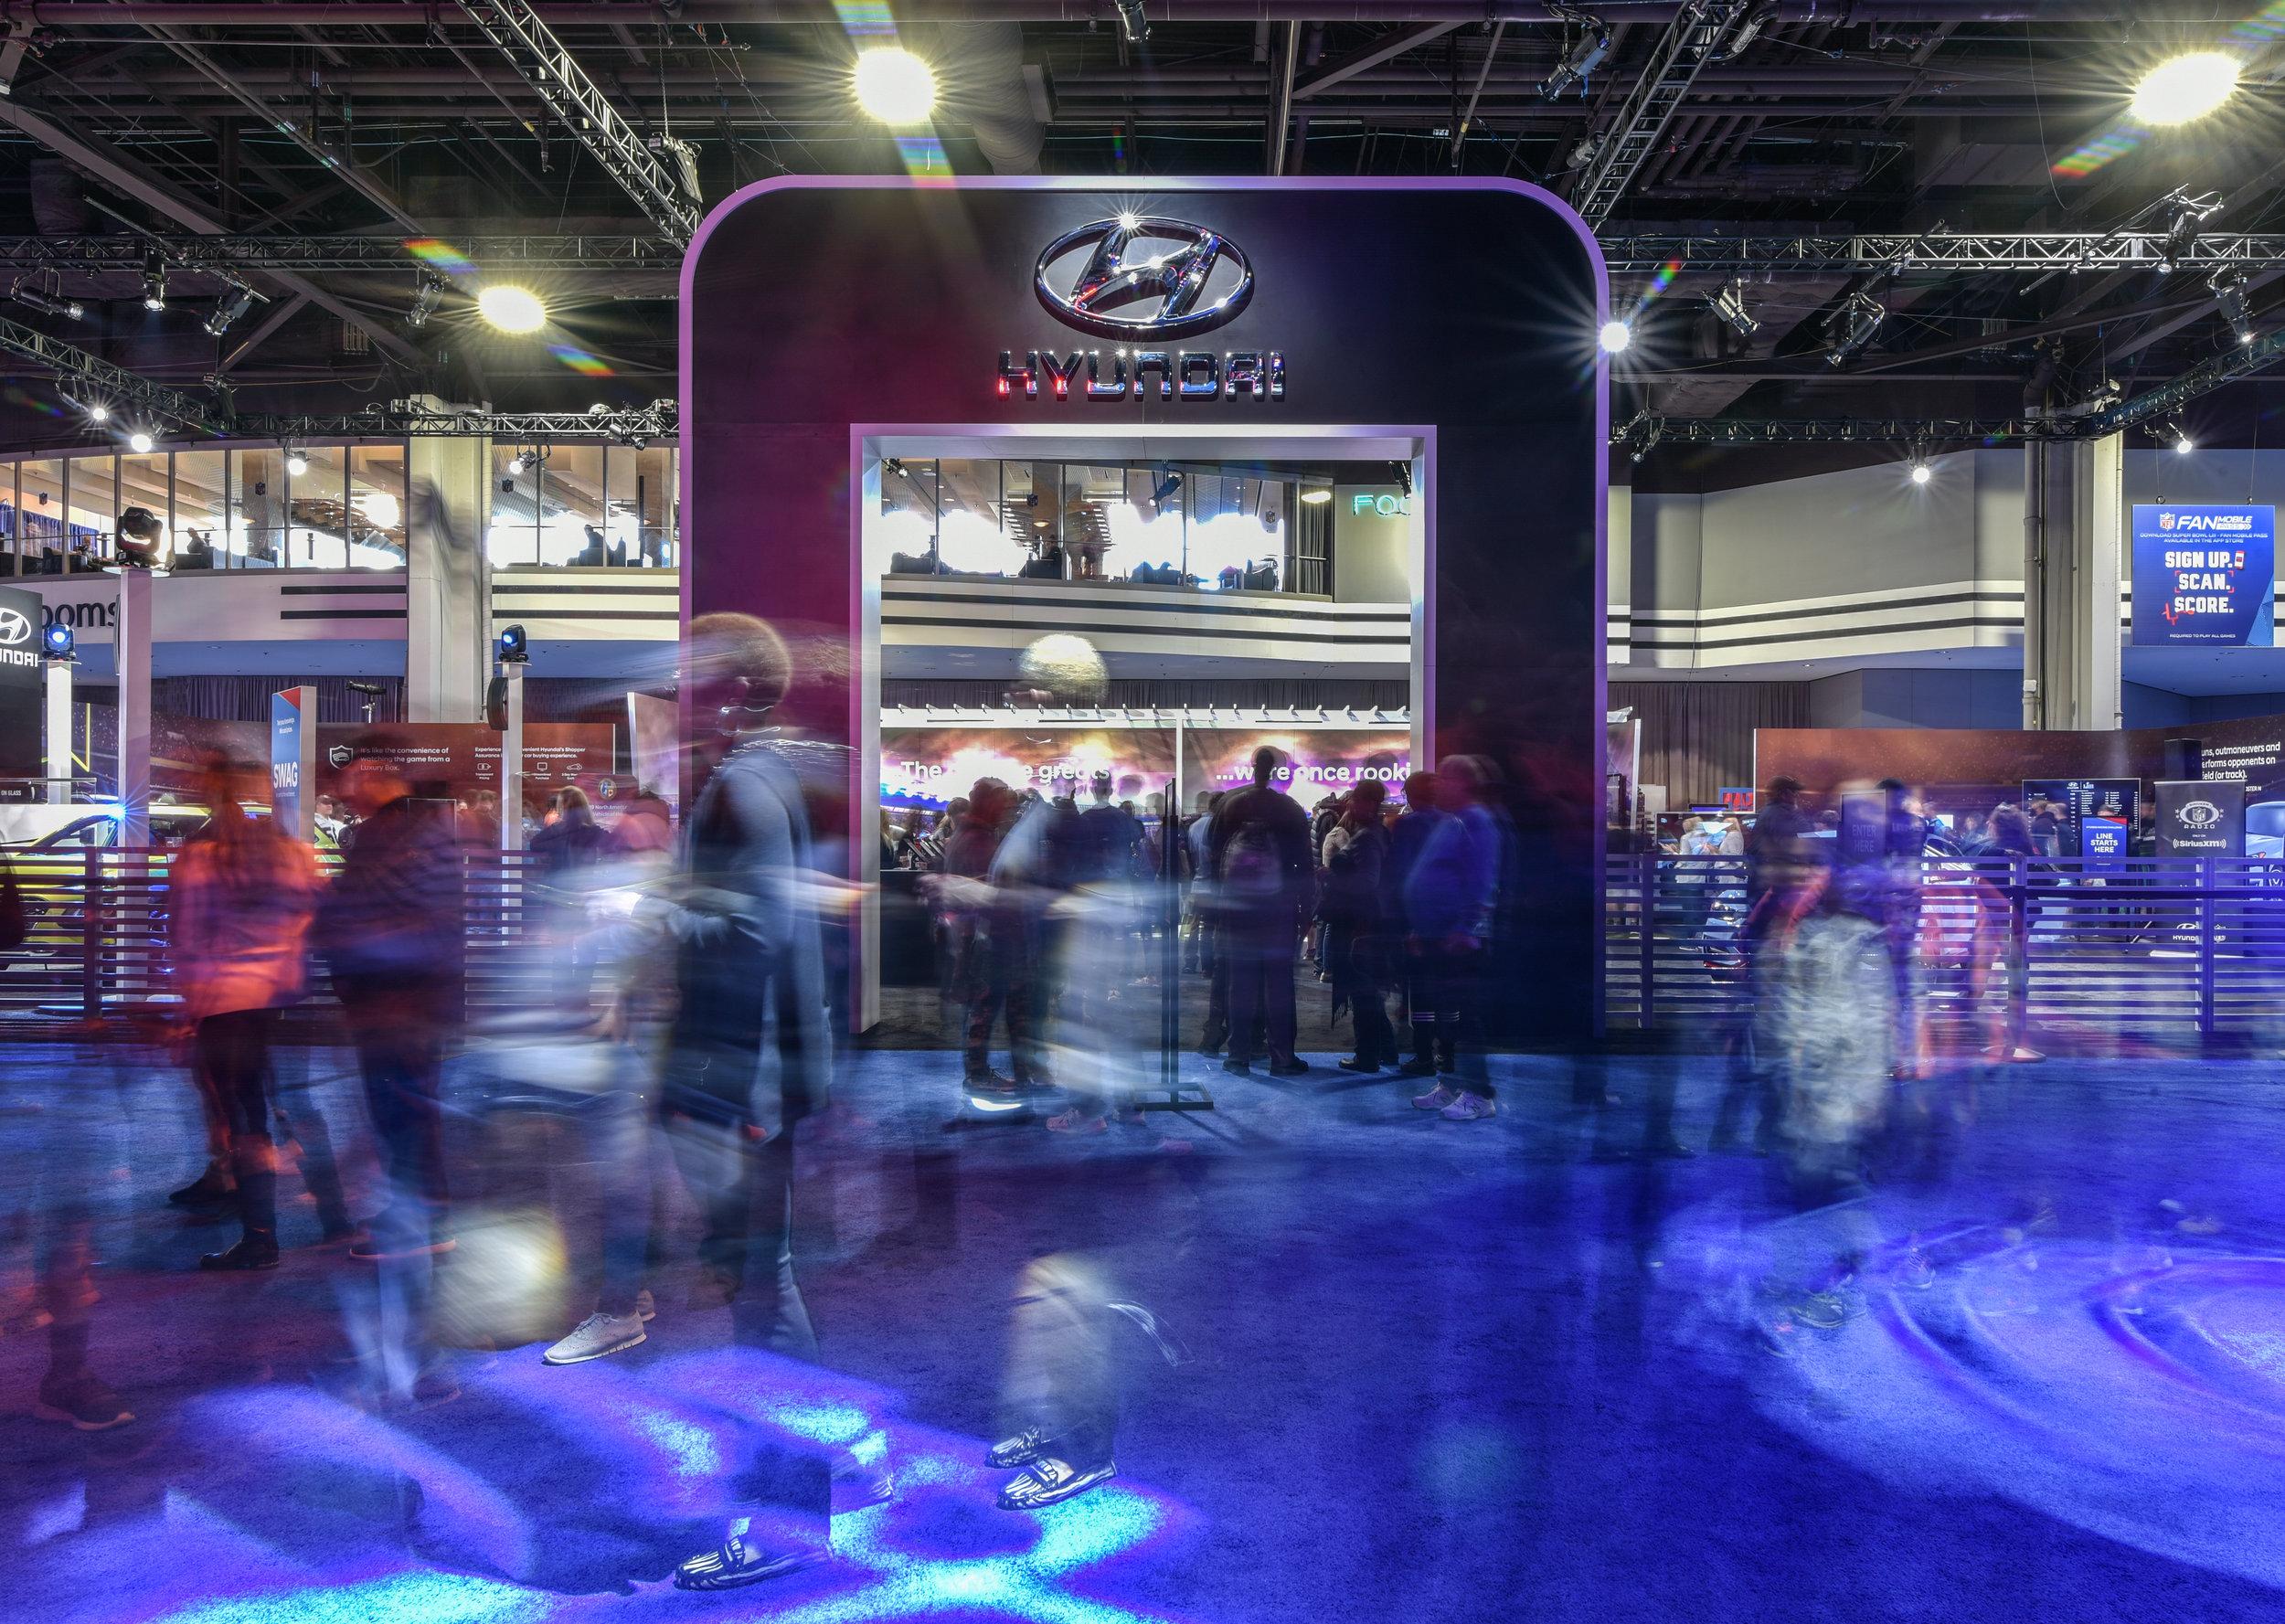 OHM-AdvantageInternational-Hyundai@SBExperience-TopSelects-2-6.jpg